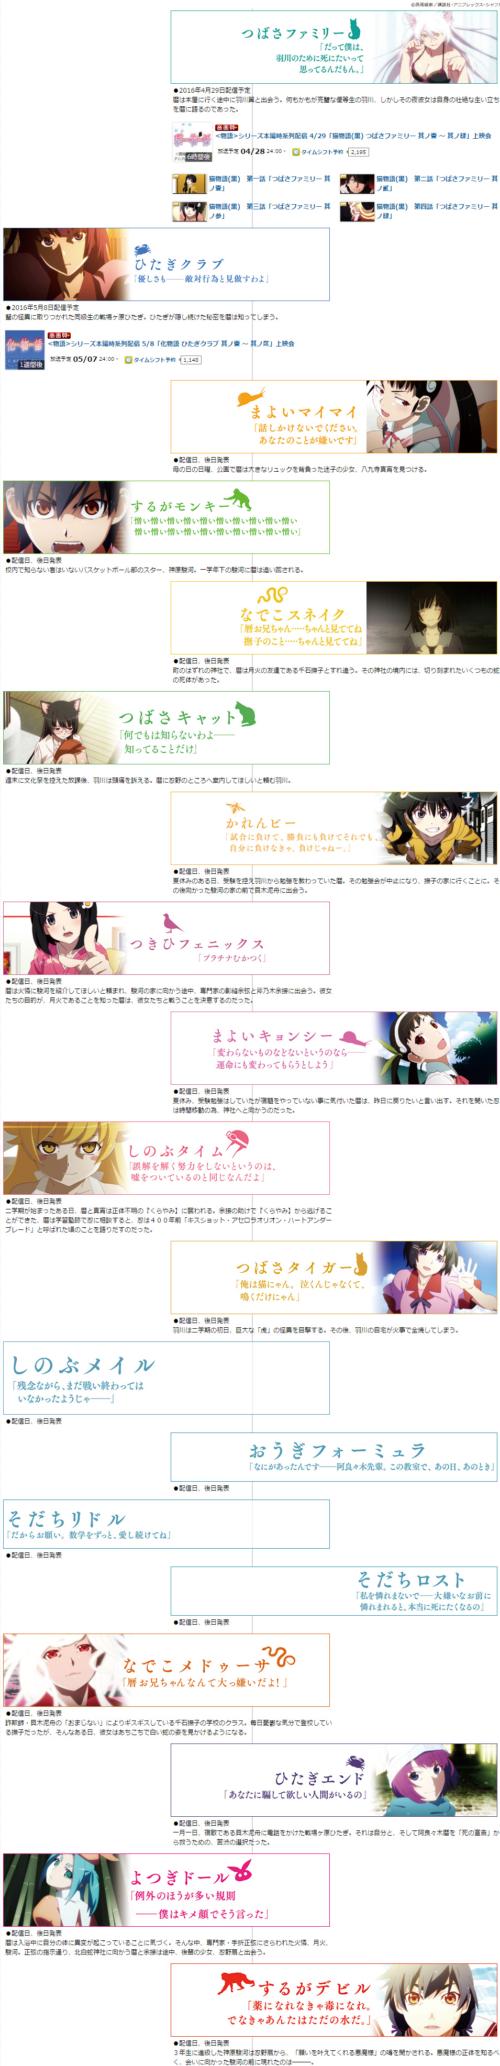 screencapture-ch-nicovideo-jp-monogatari-series-1461831447533.png